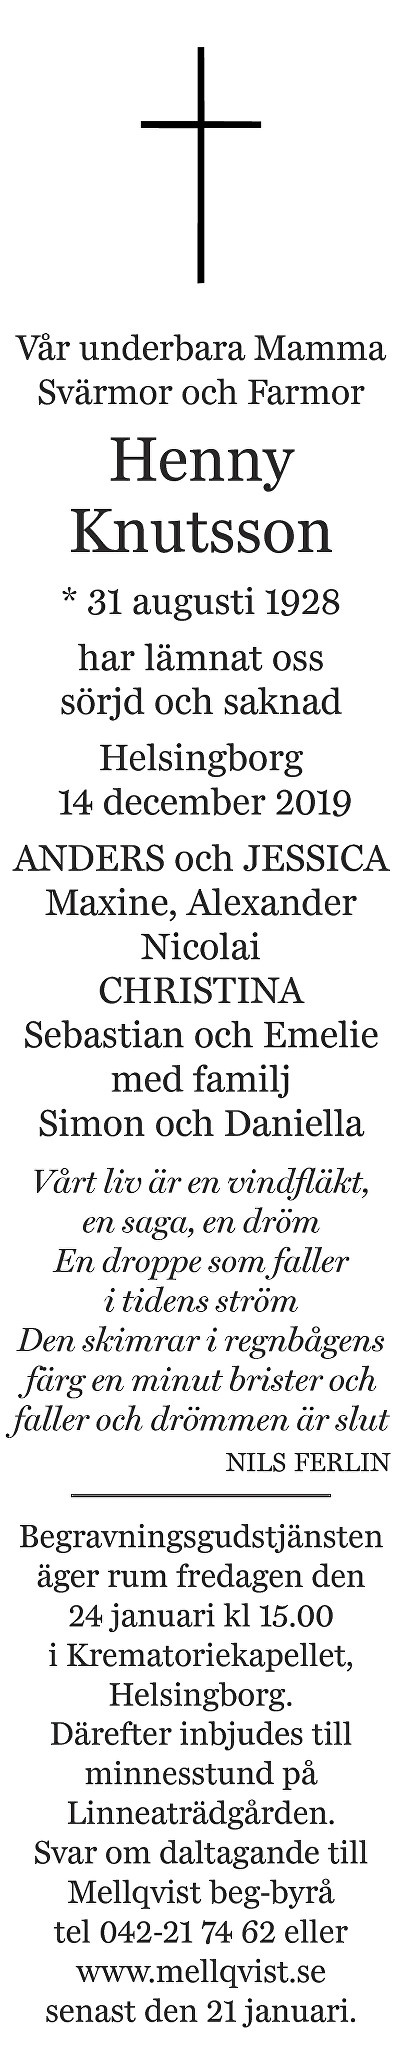 Henny Knutsson Death notice